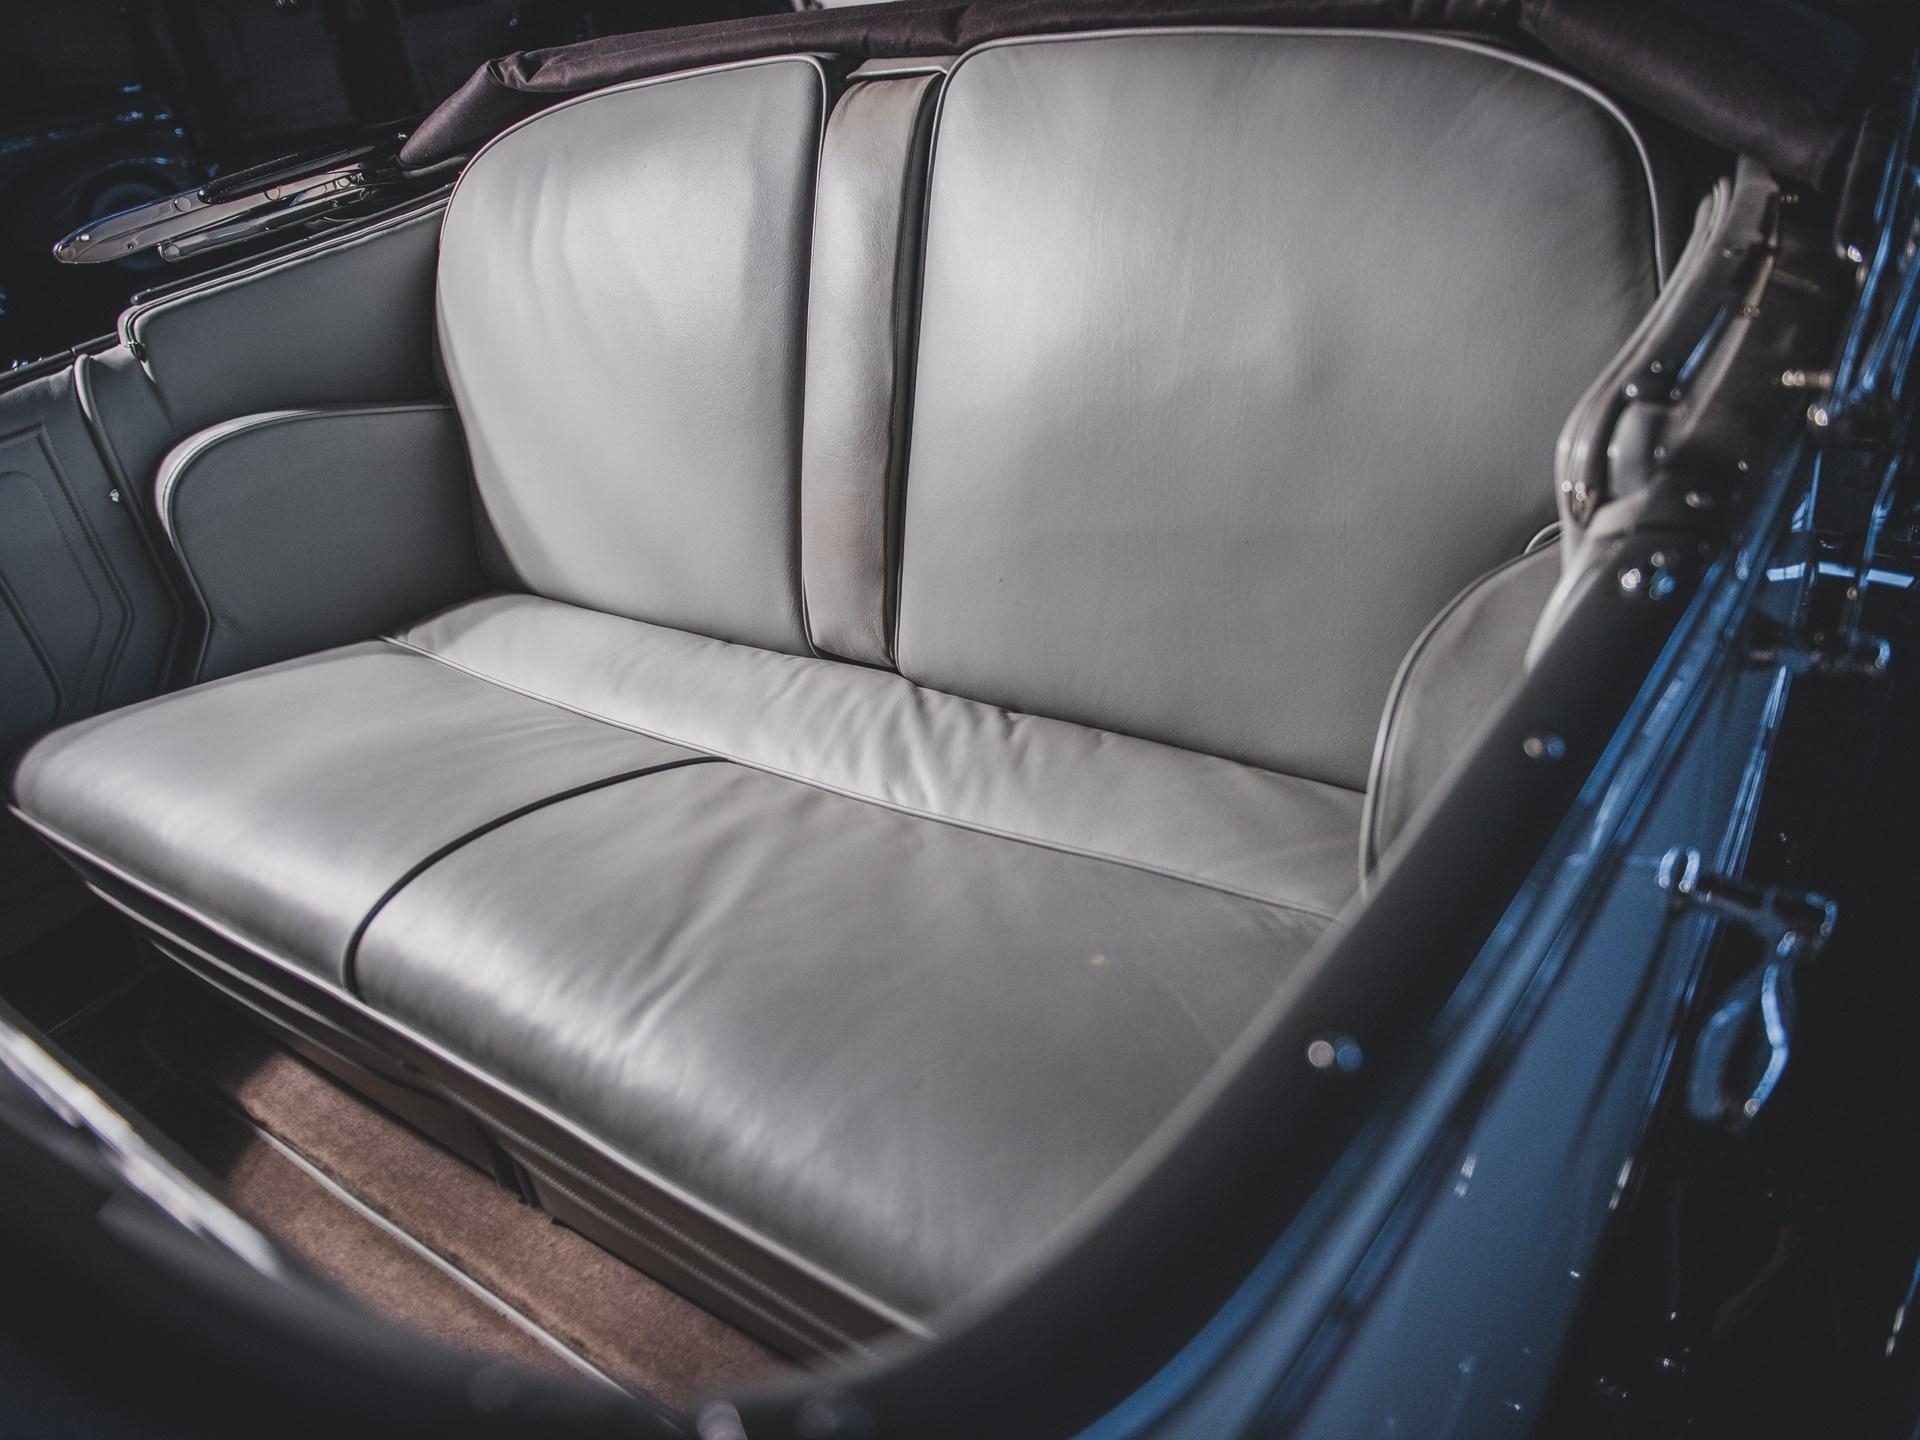 1930 Cadillac V-16 Sport Phaeton by Fleetwood